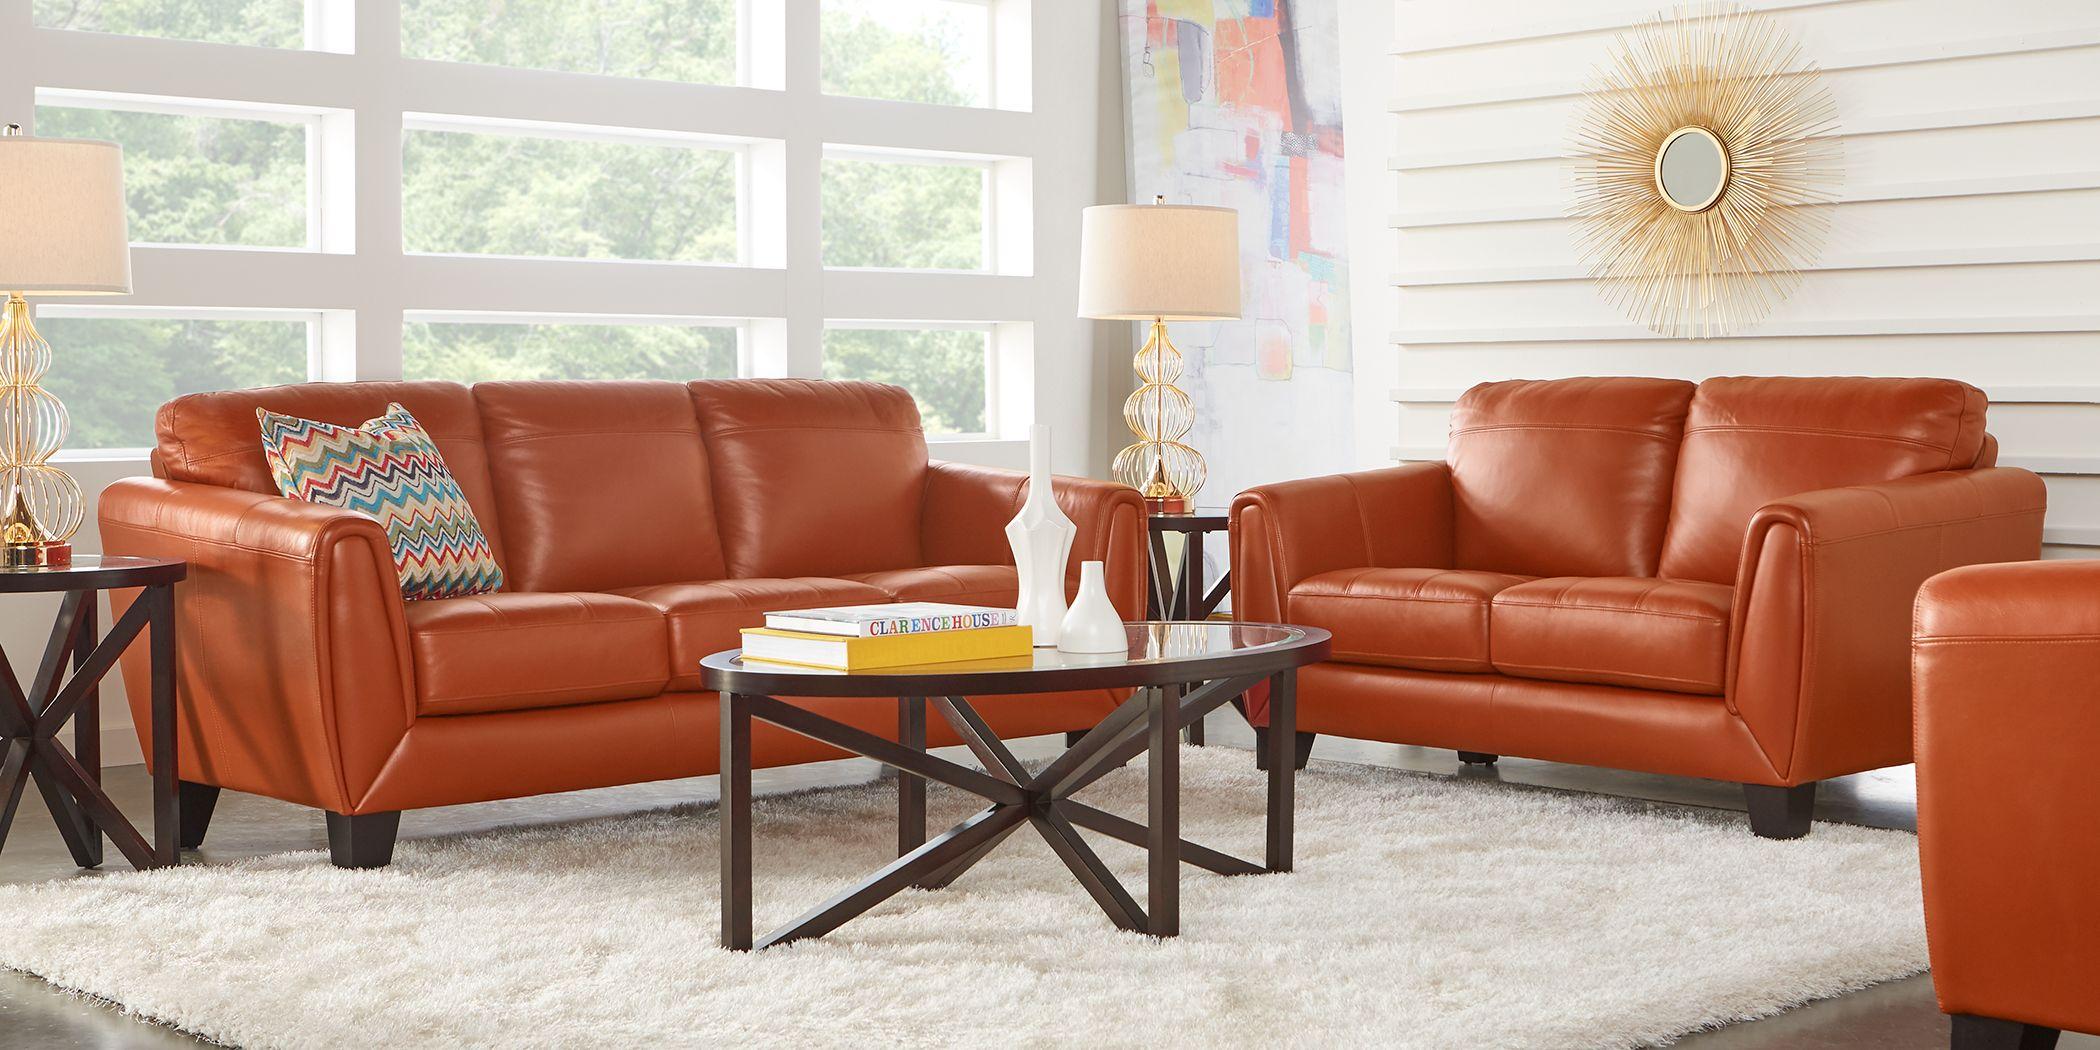 Livorno Papaya Leather 5 Pc Living Room